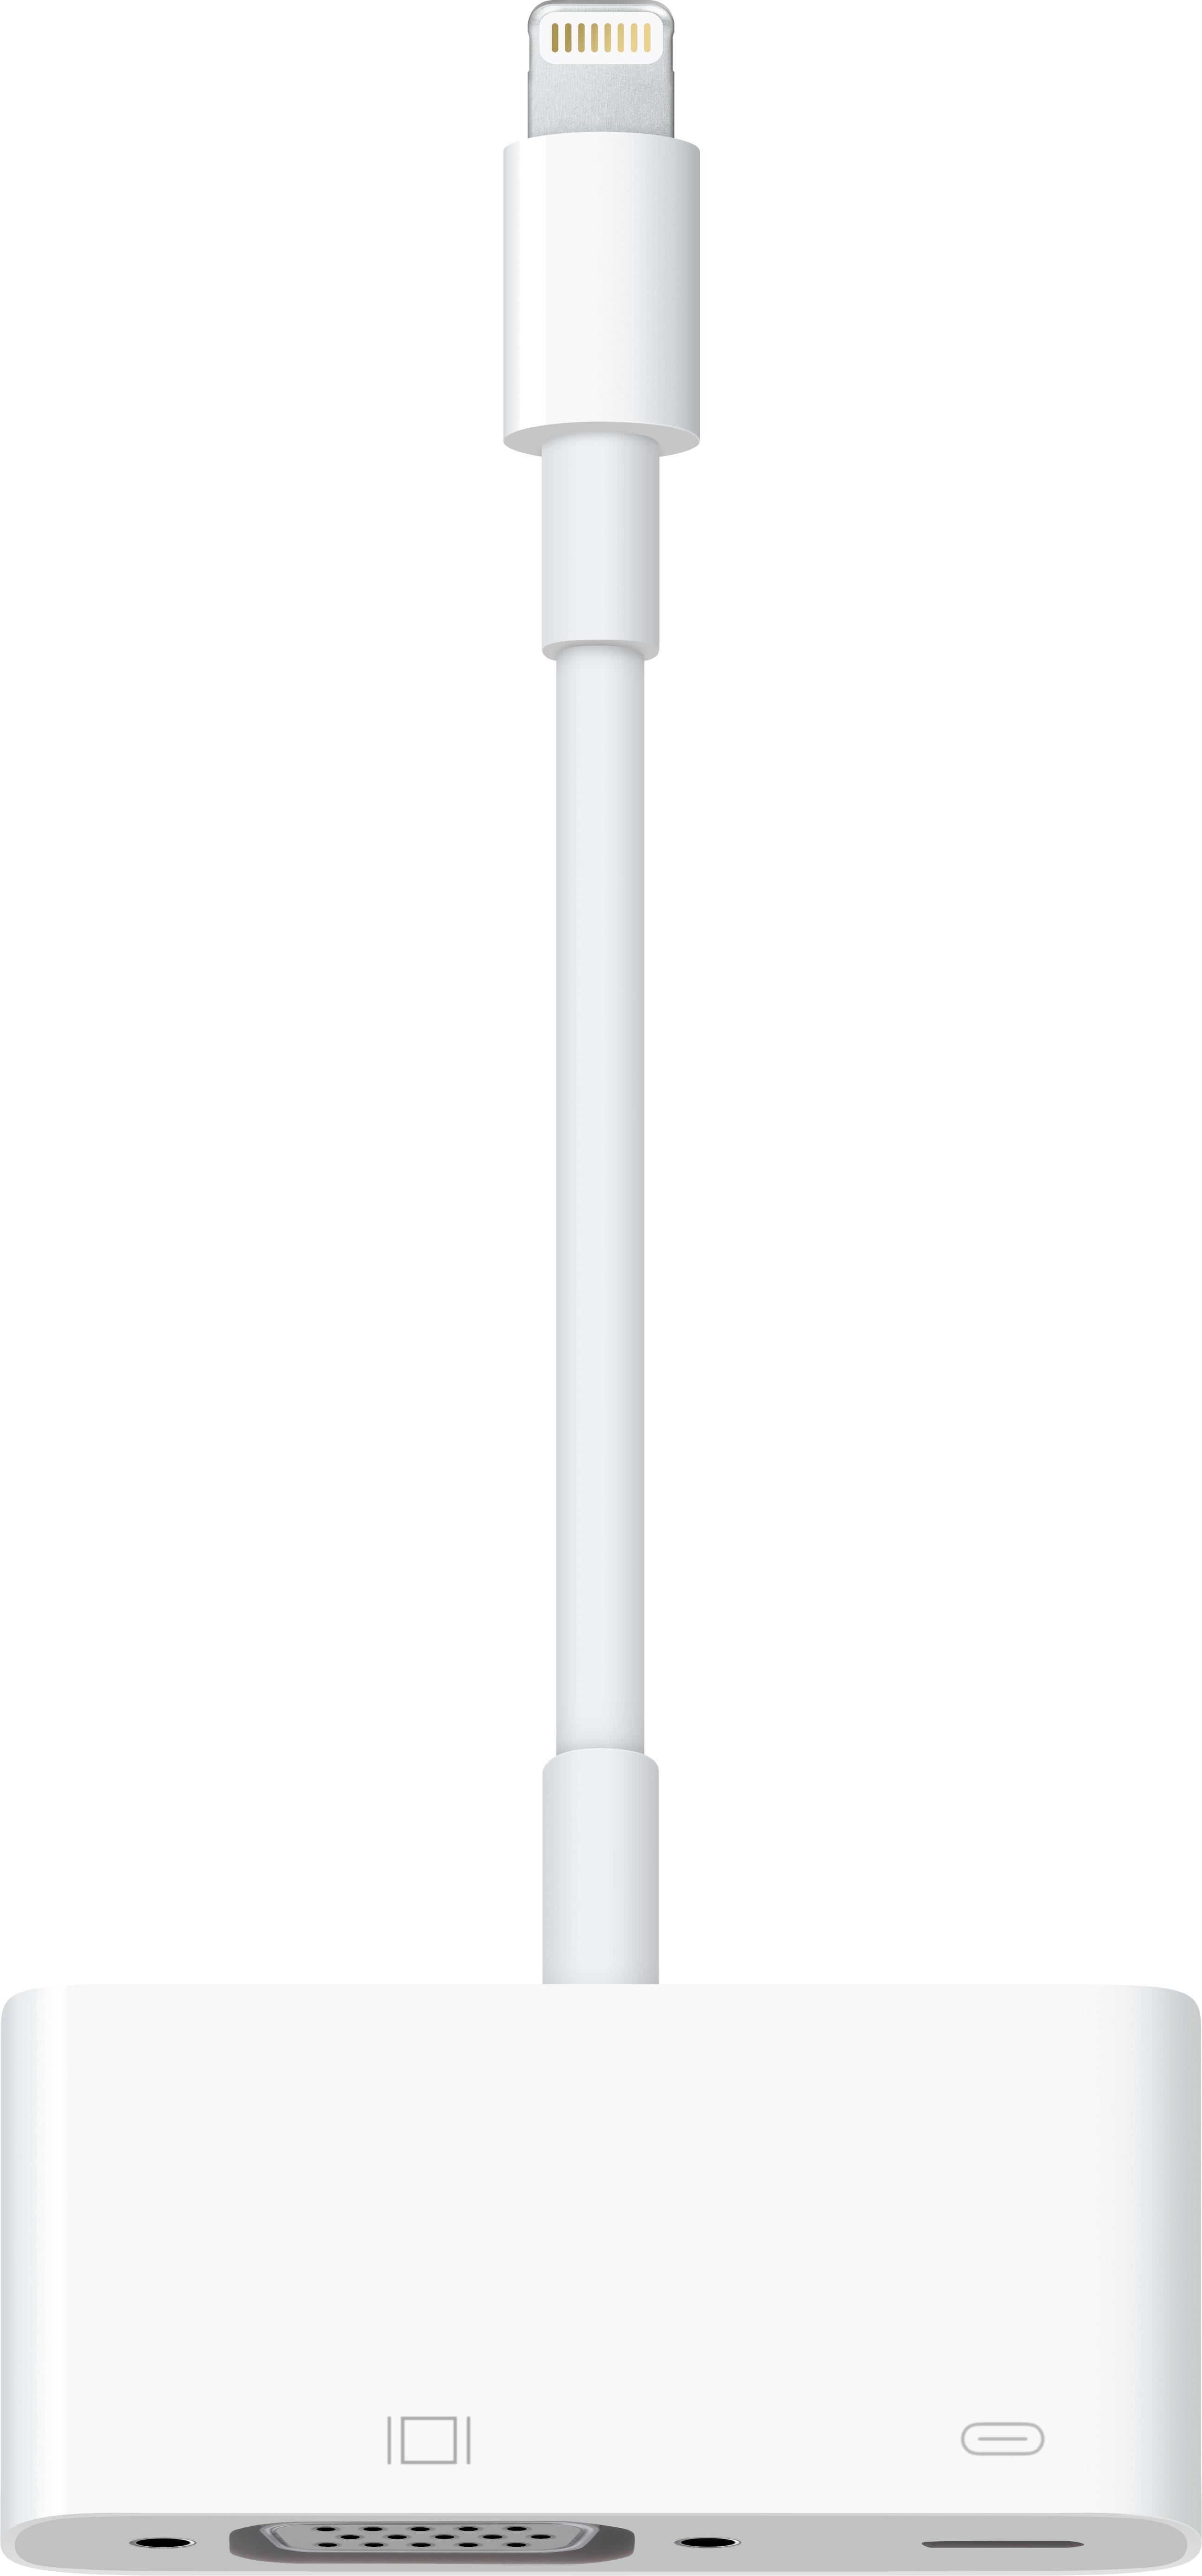 Apple Adattatore da Lightning a VGA